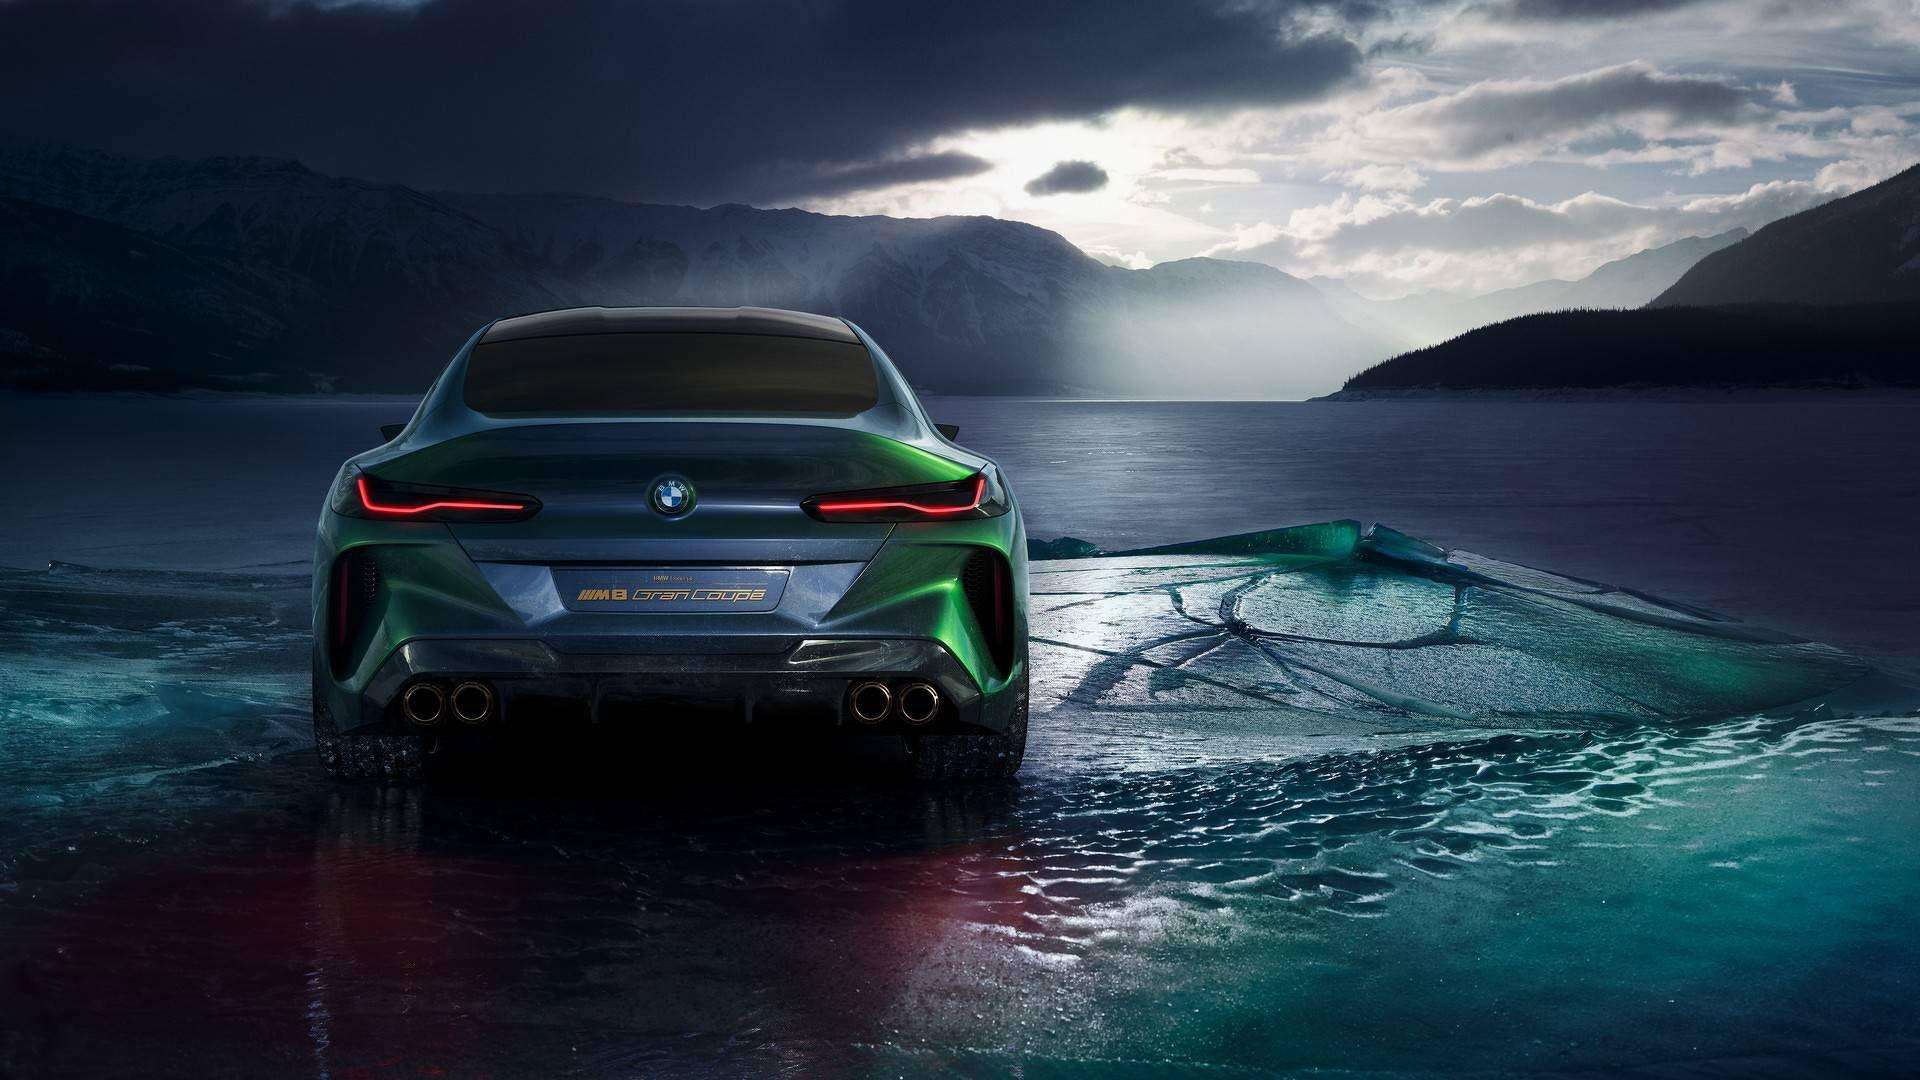 bmw-concept-m8-gran-coupe